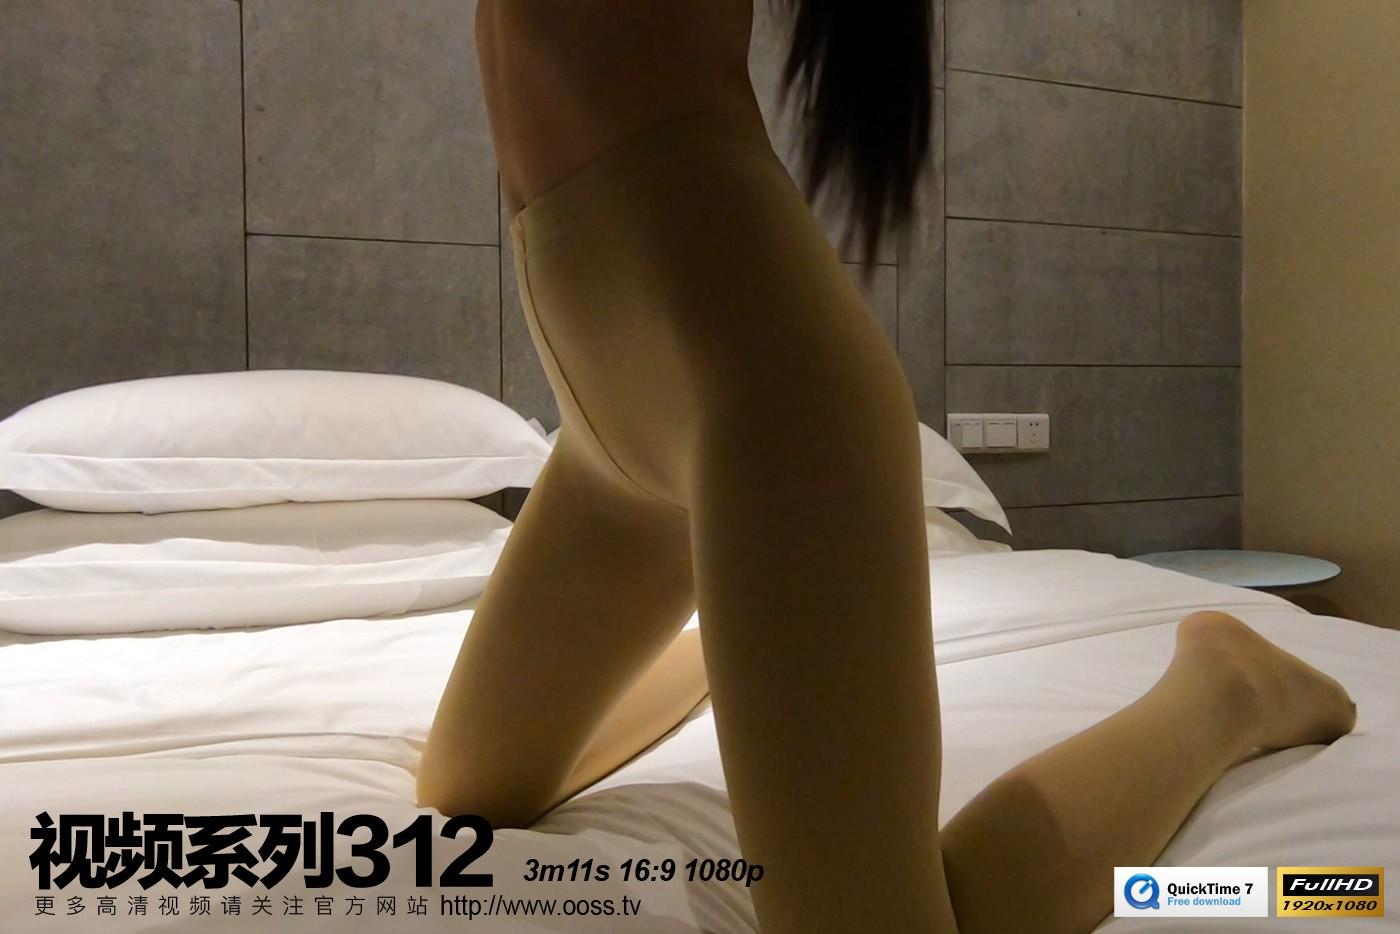 Rosi视频系列 No.312